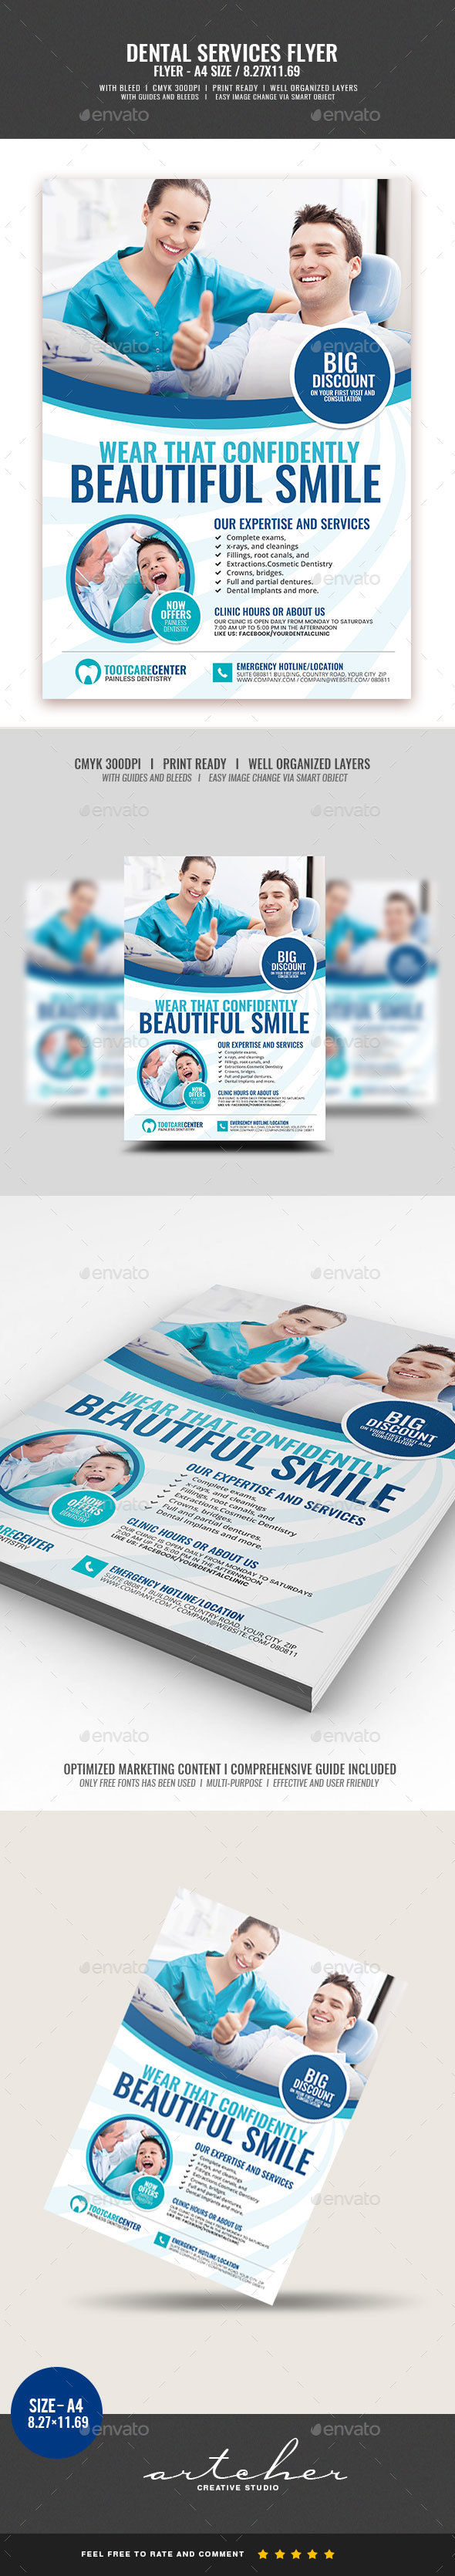 Dental Services Flyer v2 - Corporate Flyers